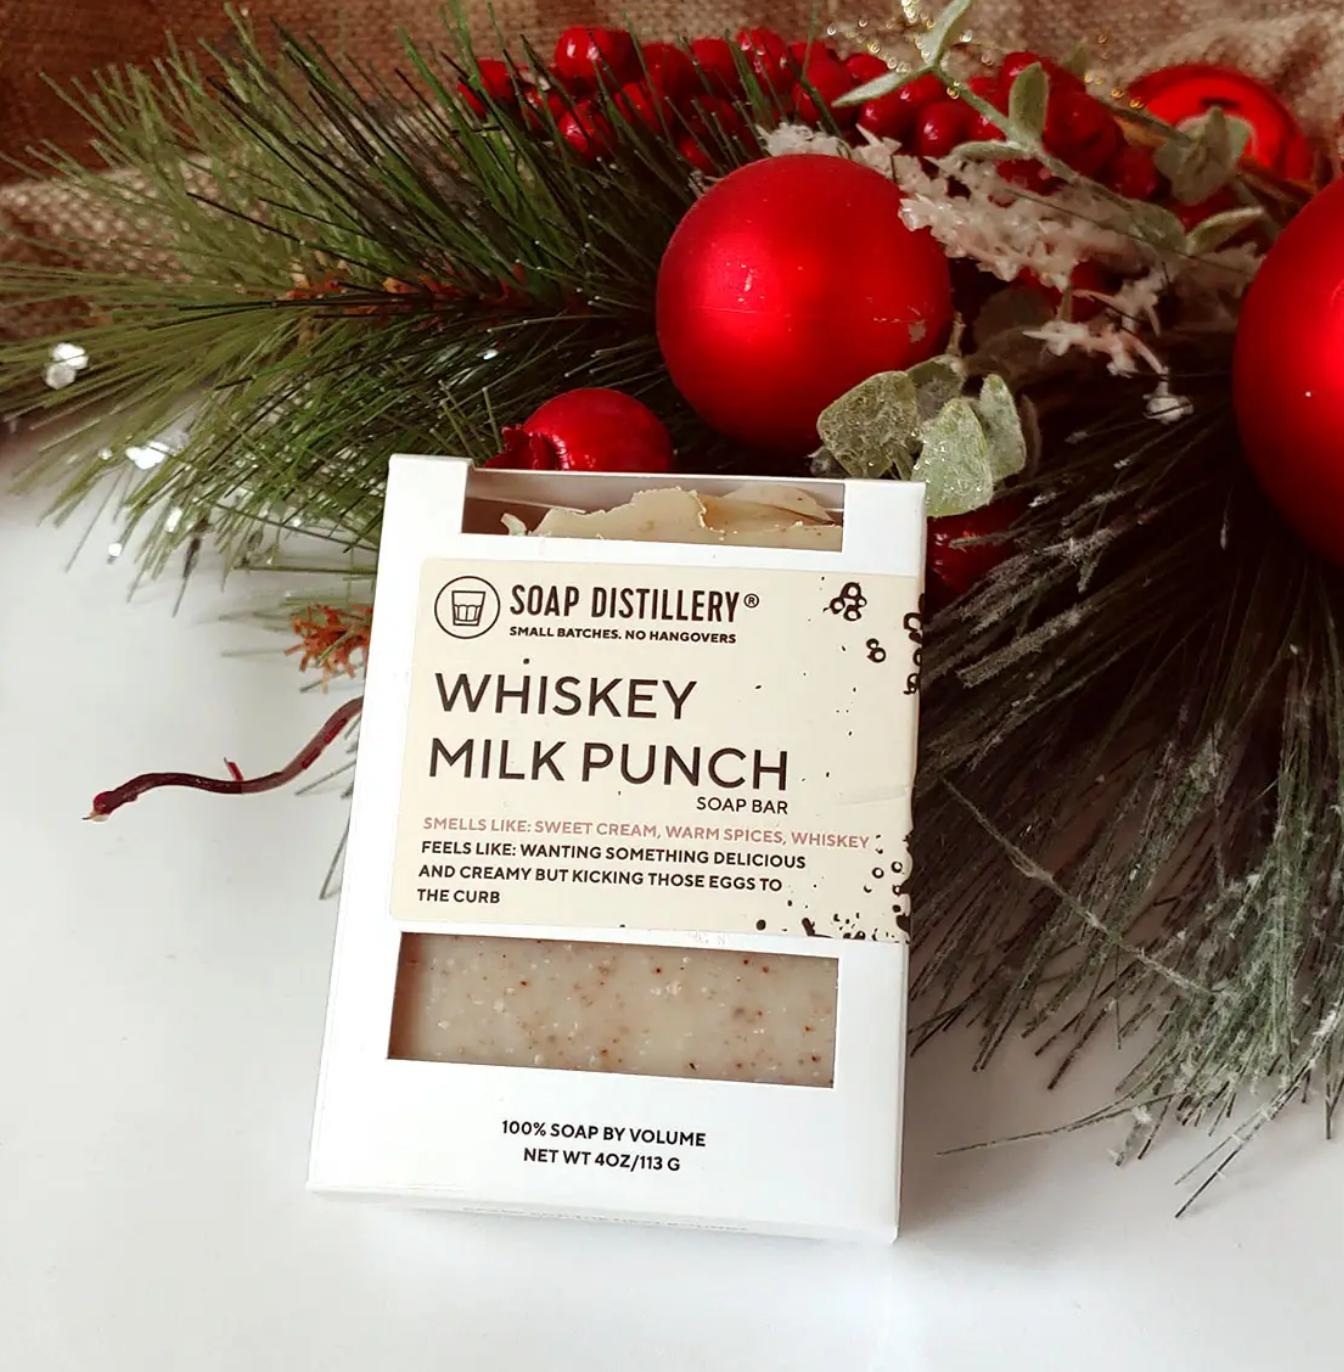 Soap Distillery Whiskey Milk Punch Soap Bar